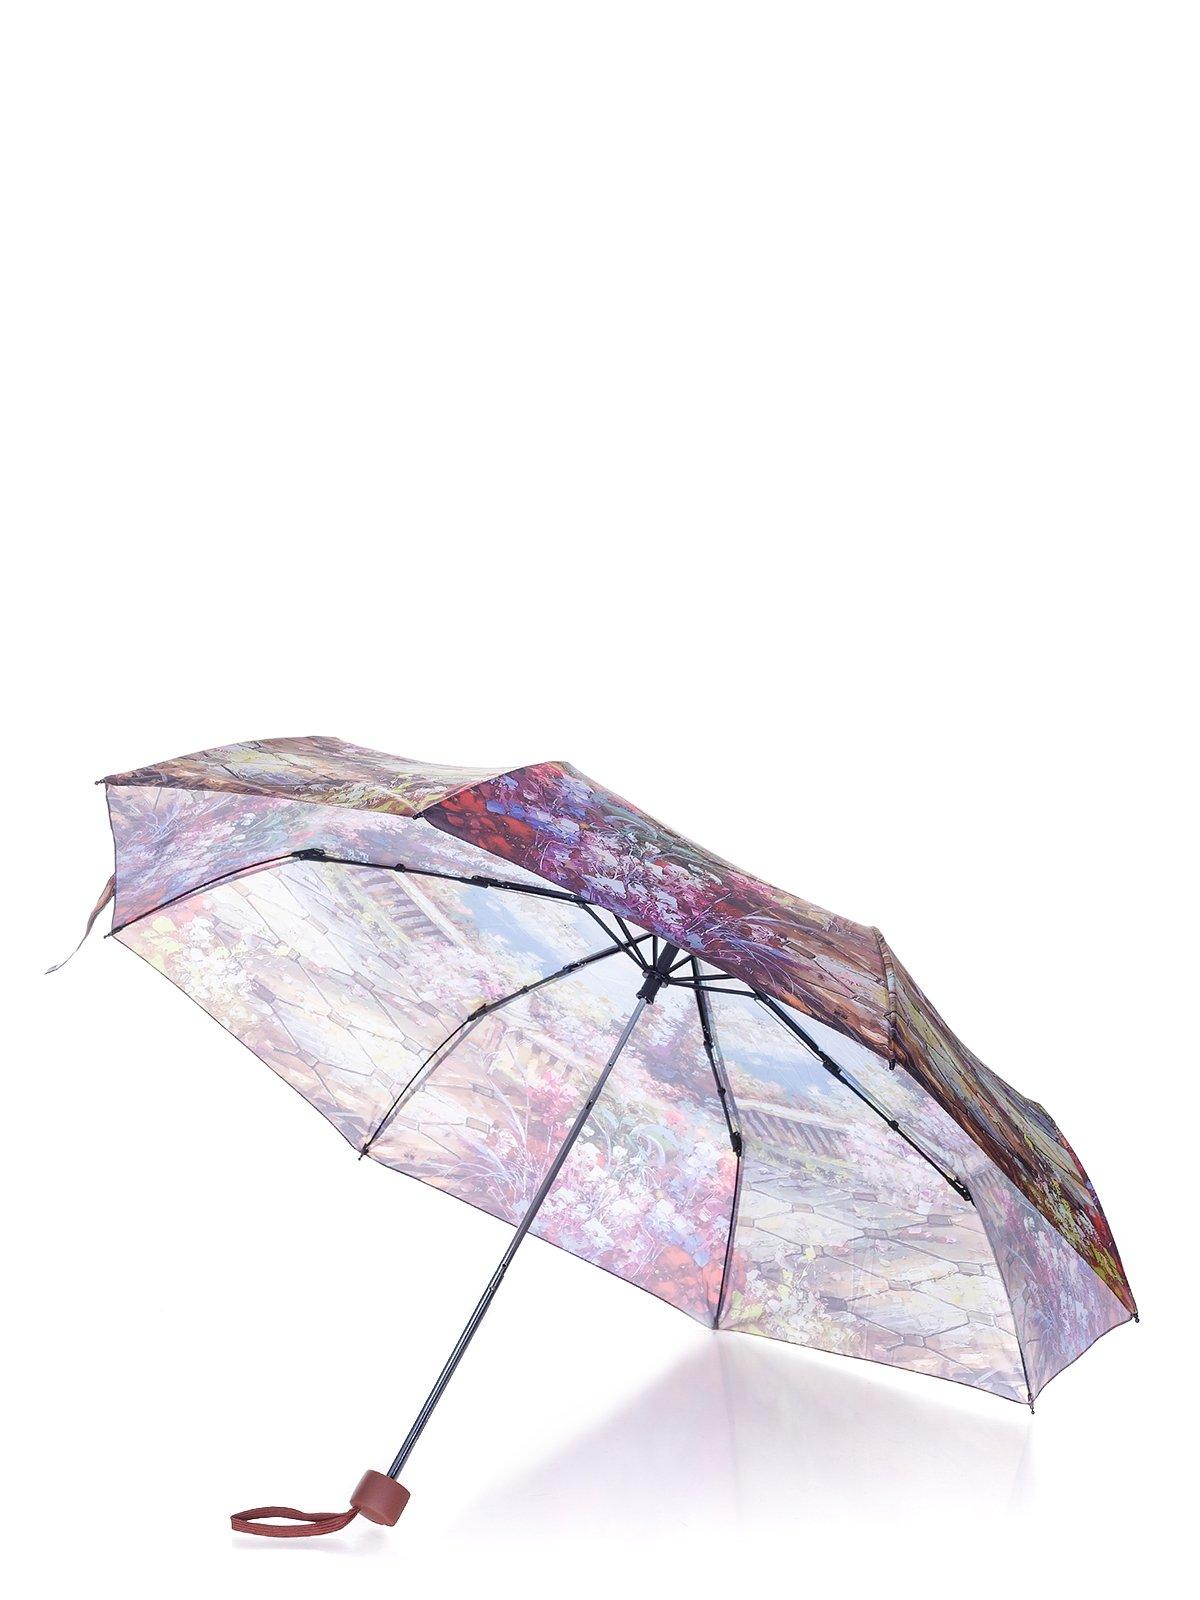 Зонт | 3754578 | фото 2